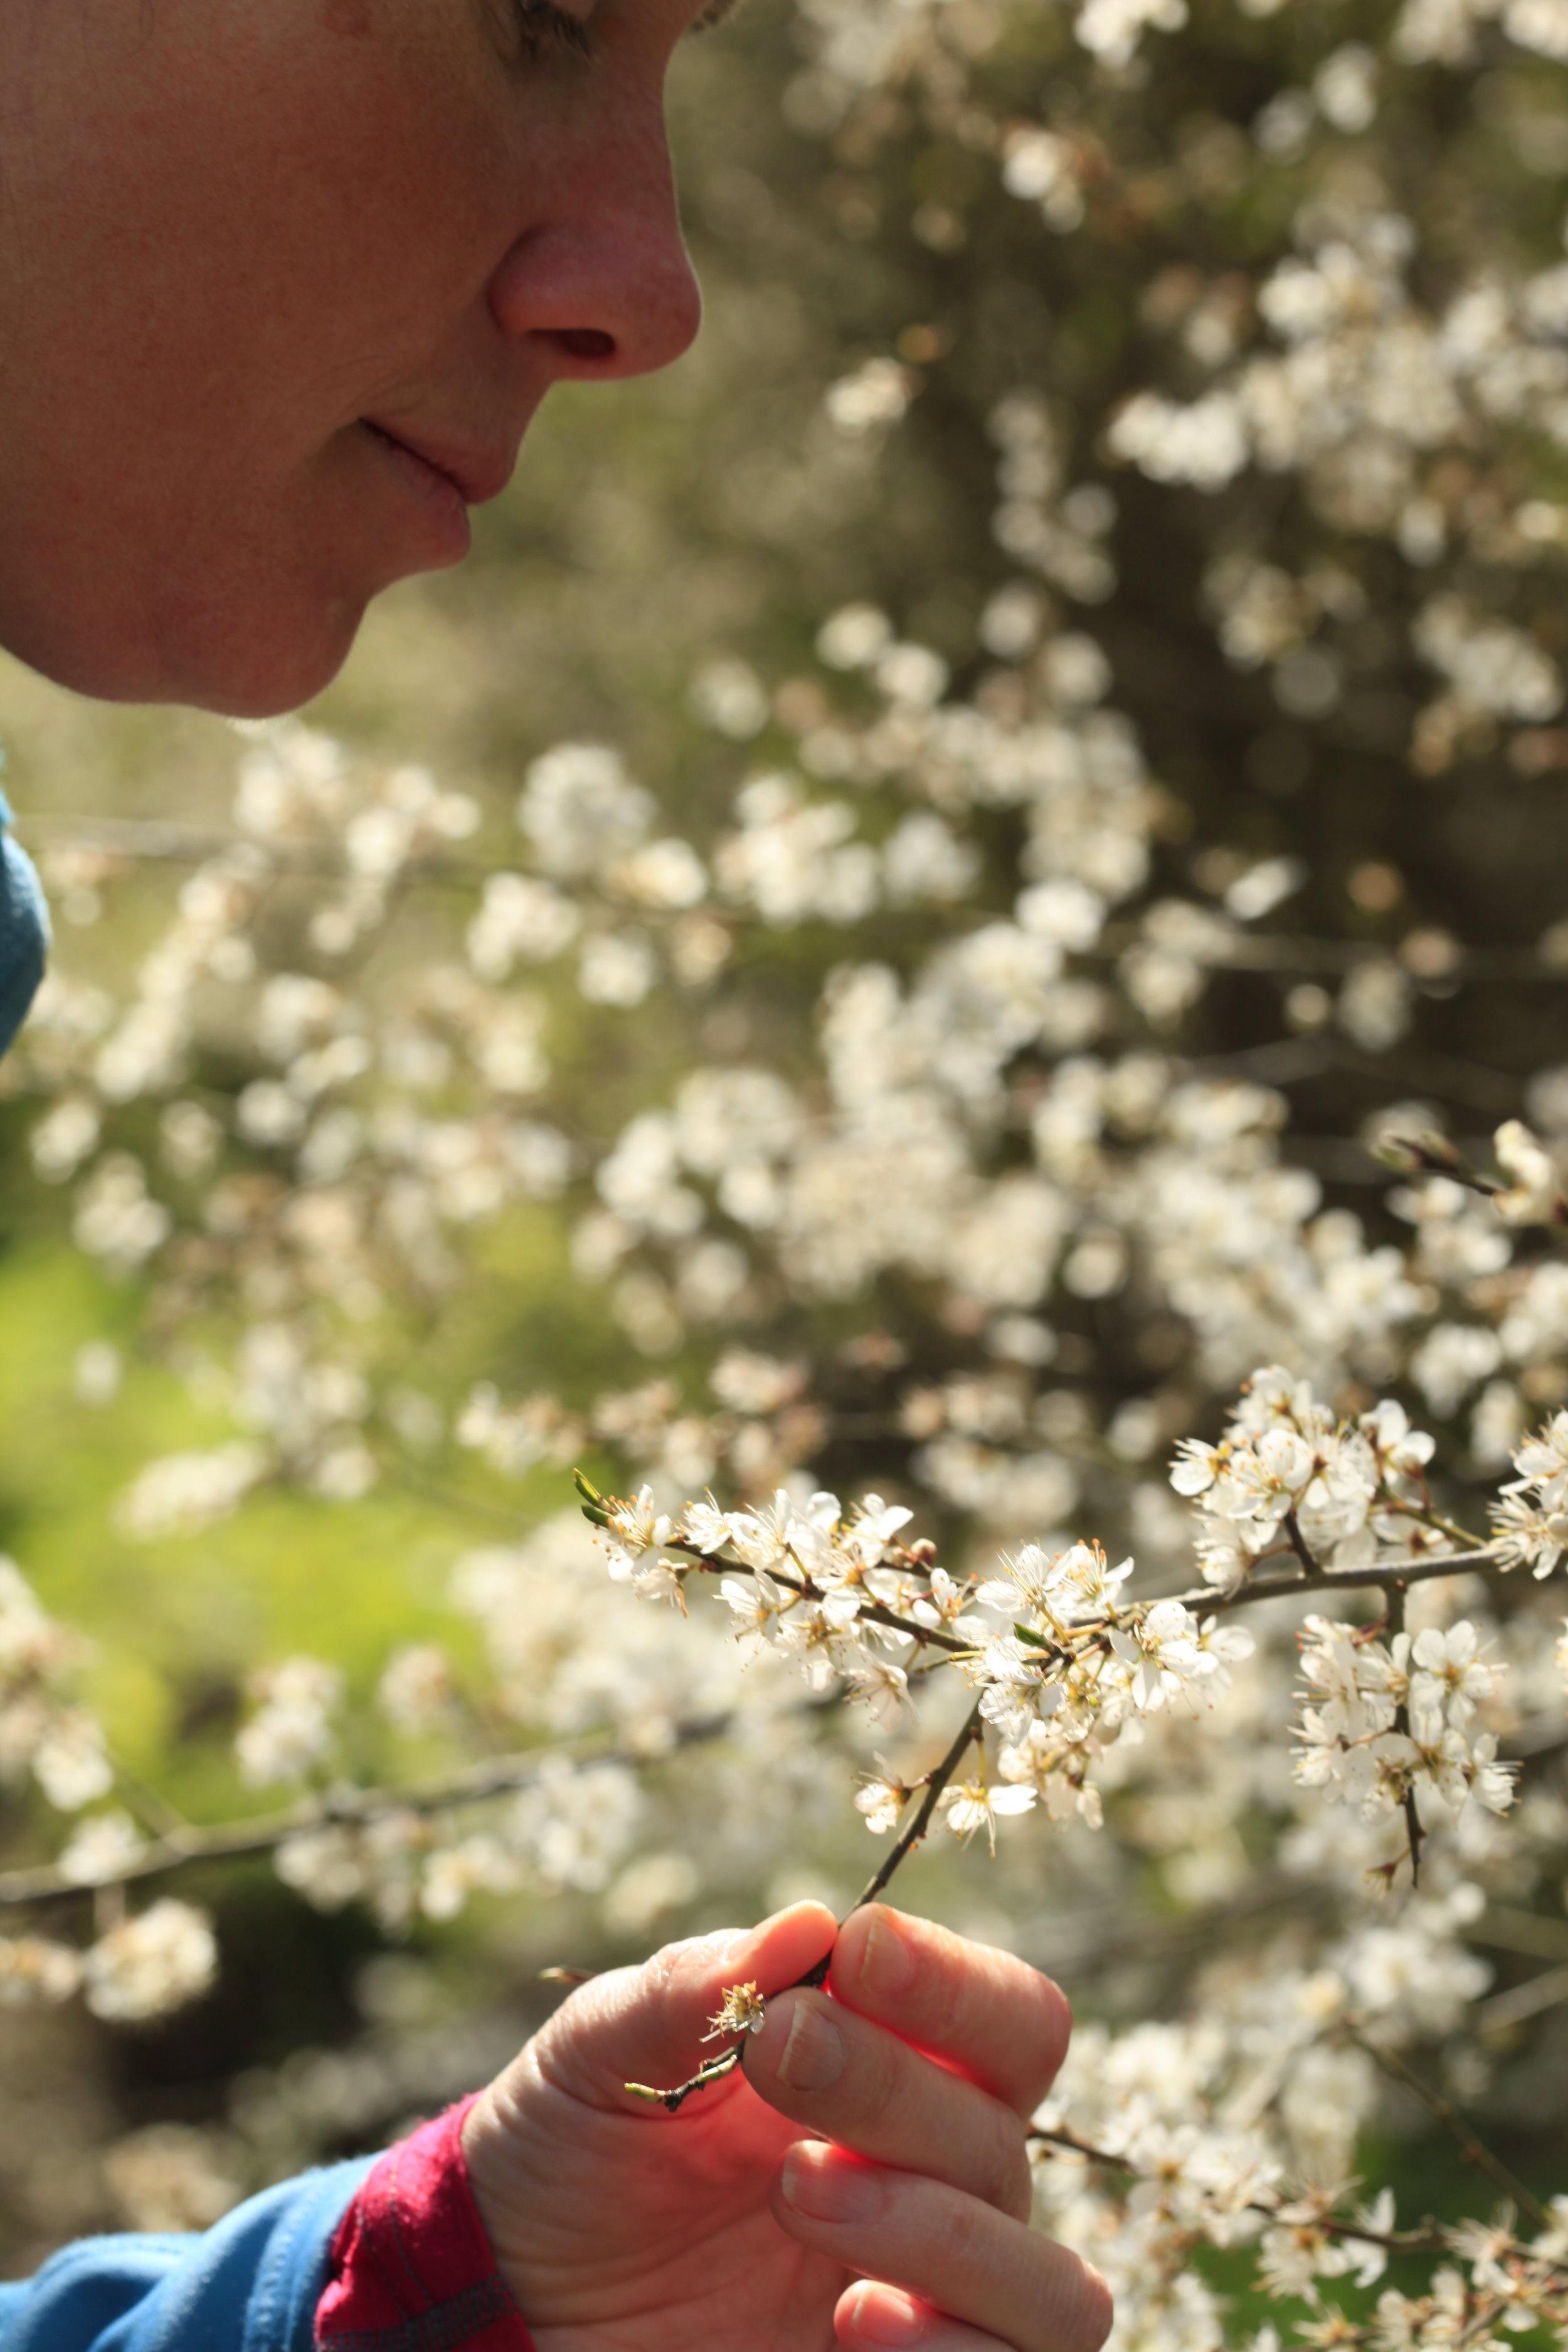 001Blackthorn Blossom Bedford Purlieus Northamptonshire Spring .JPG